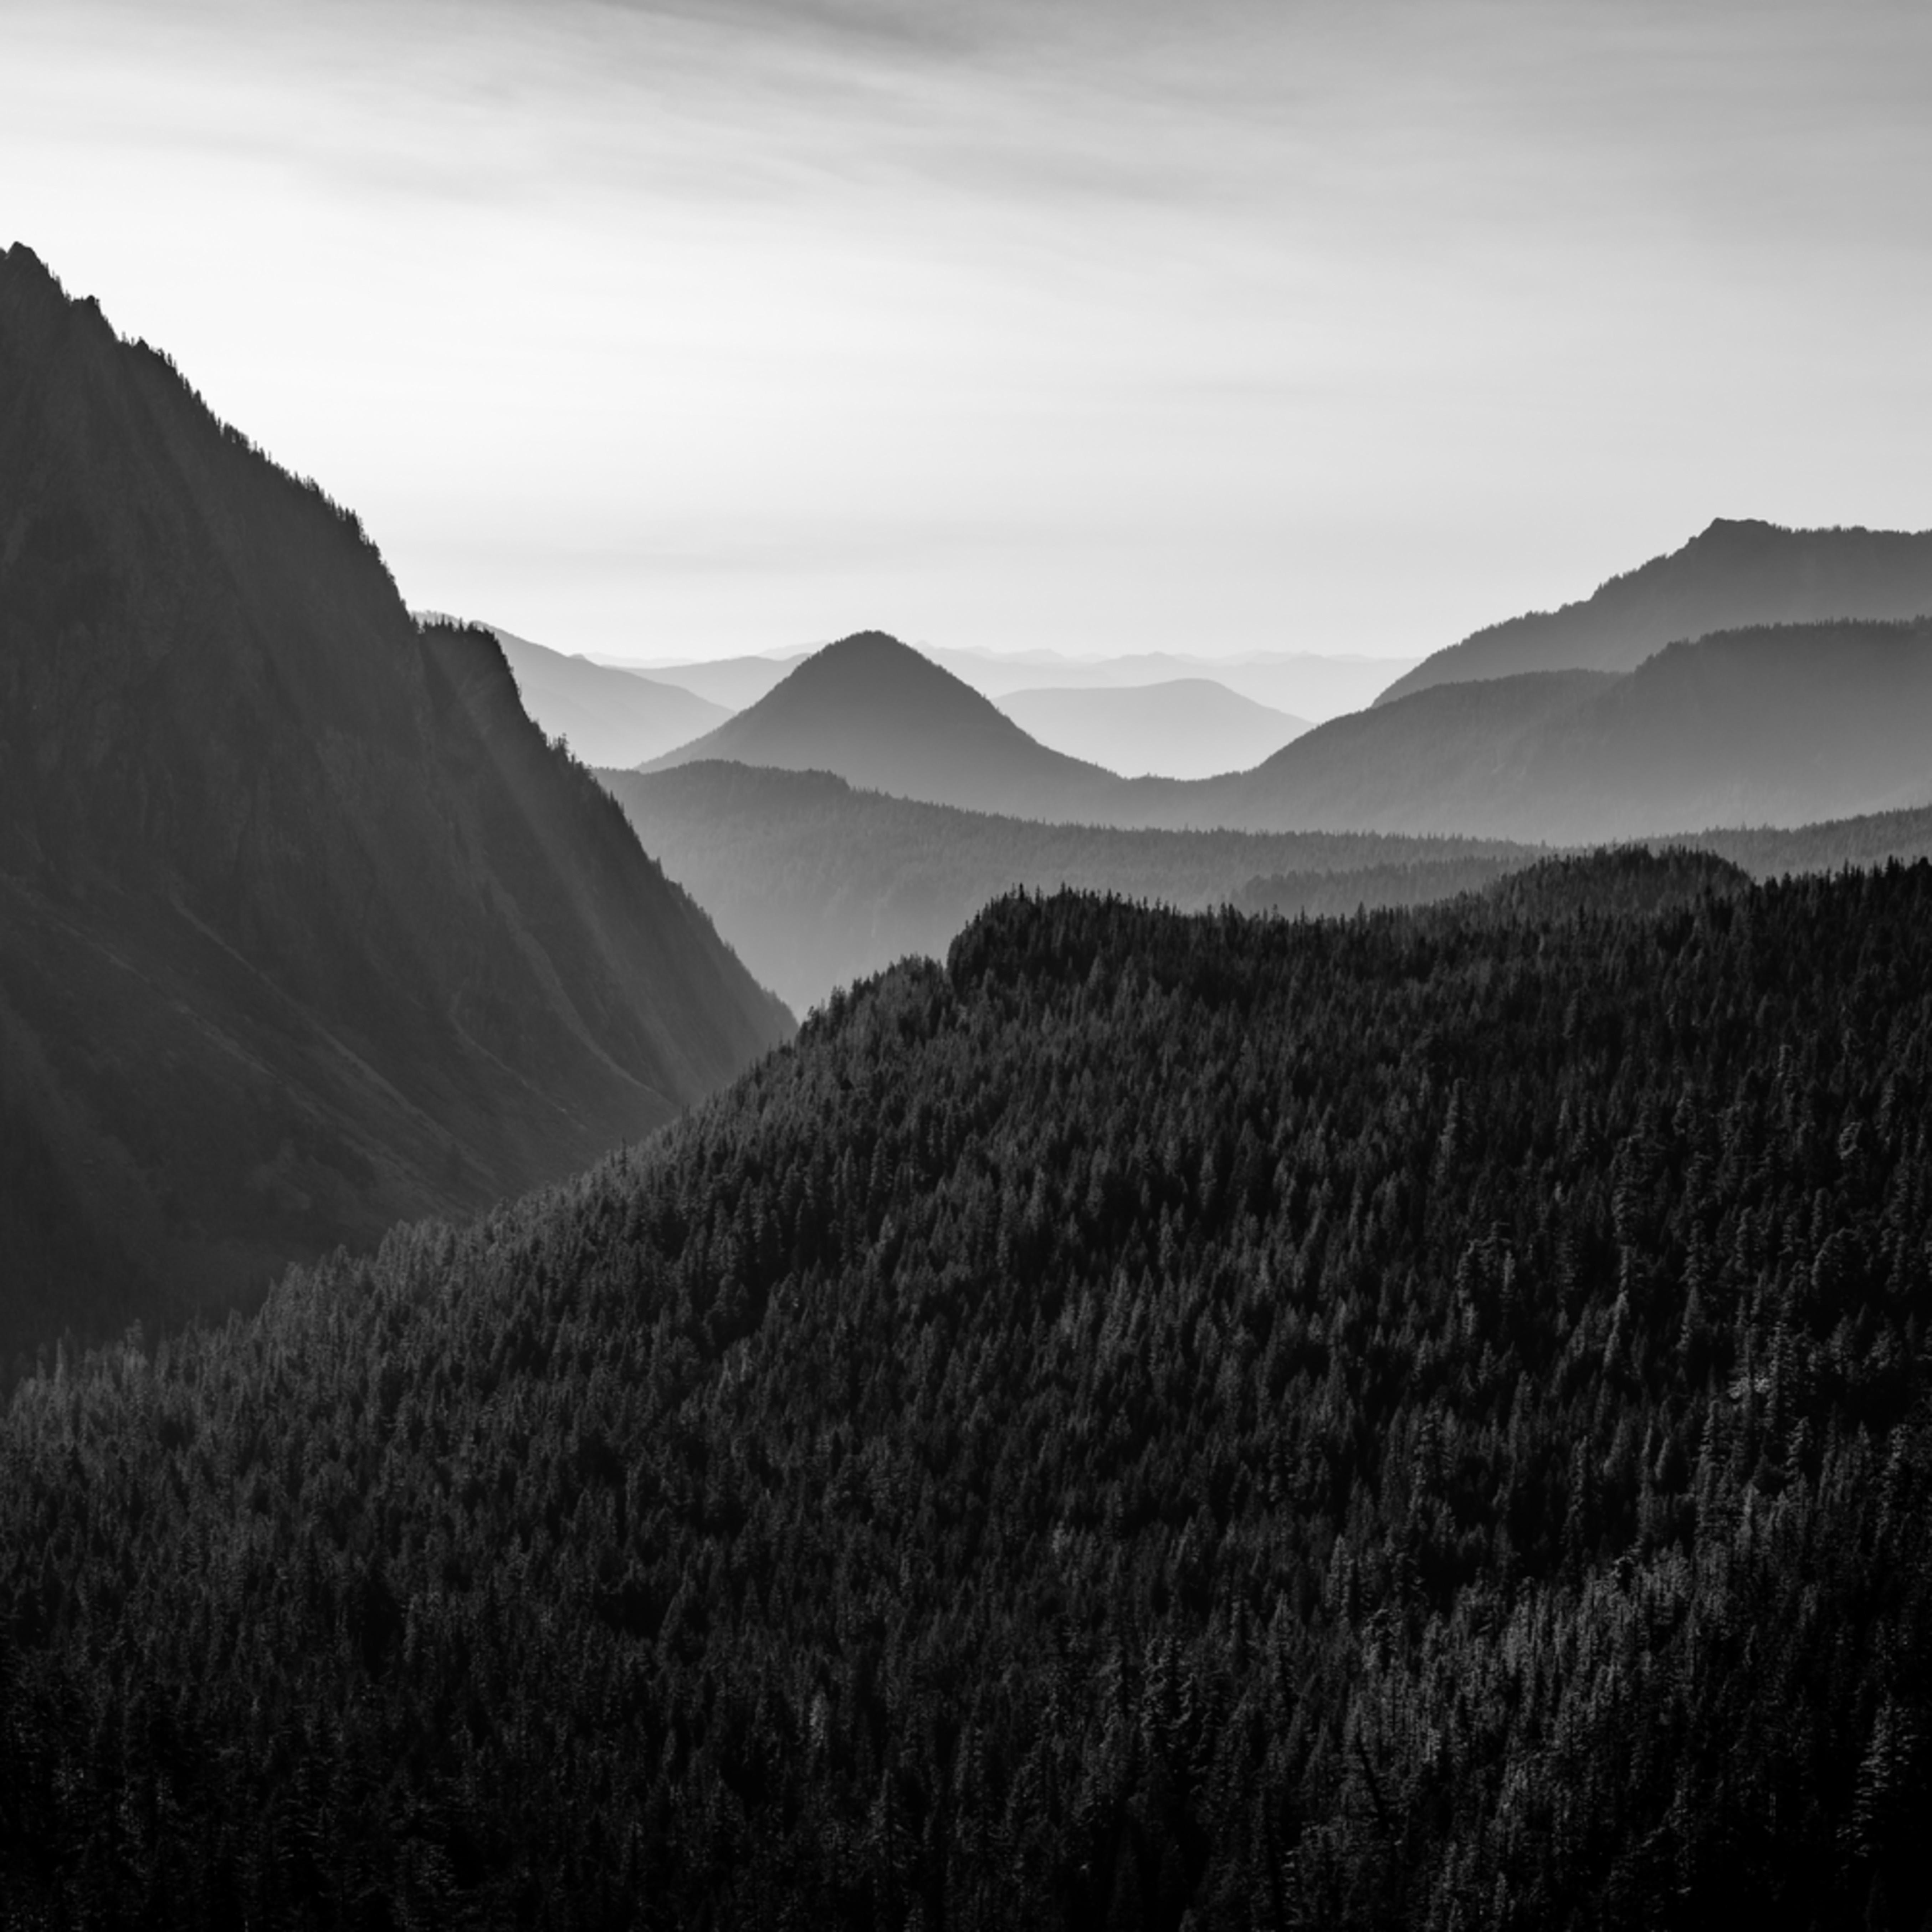 Ridges mt rainier national park washington 2020 ifetbe